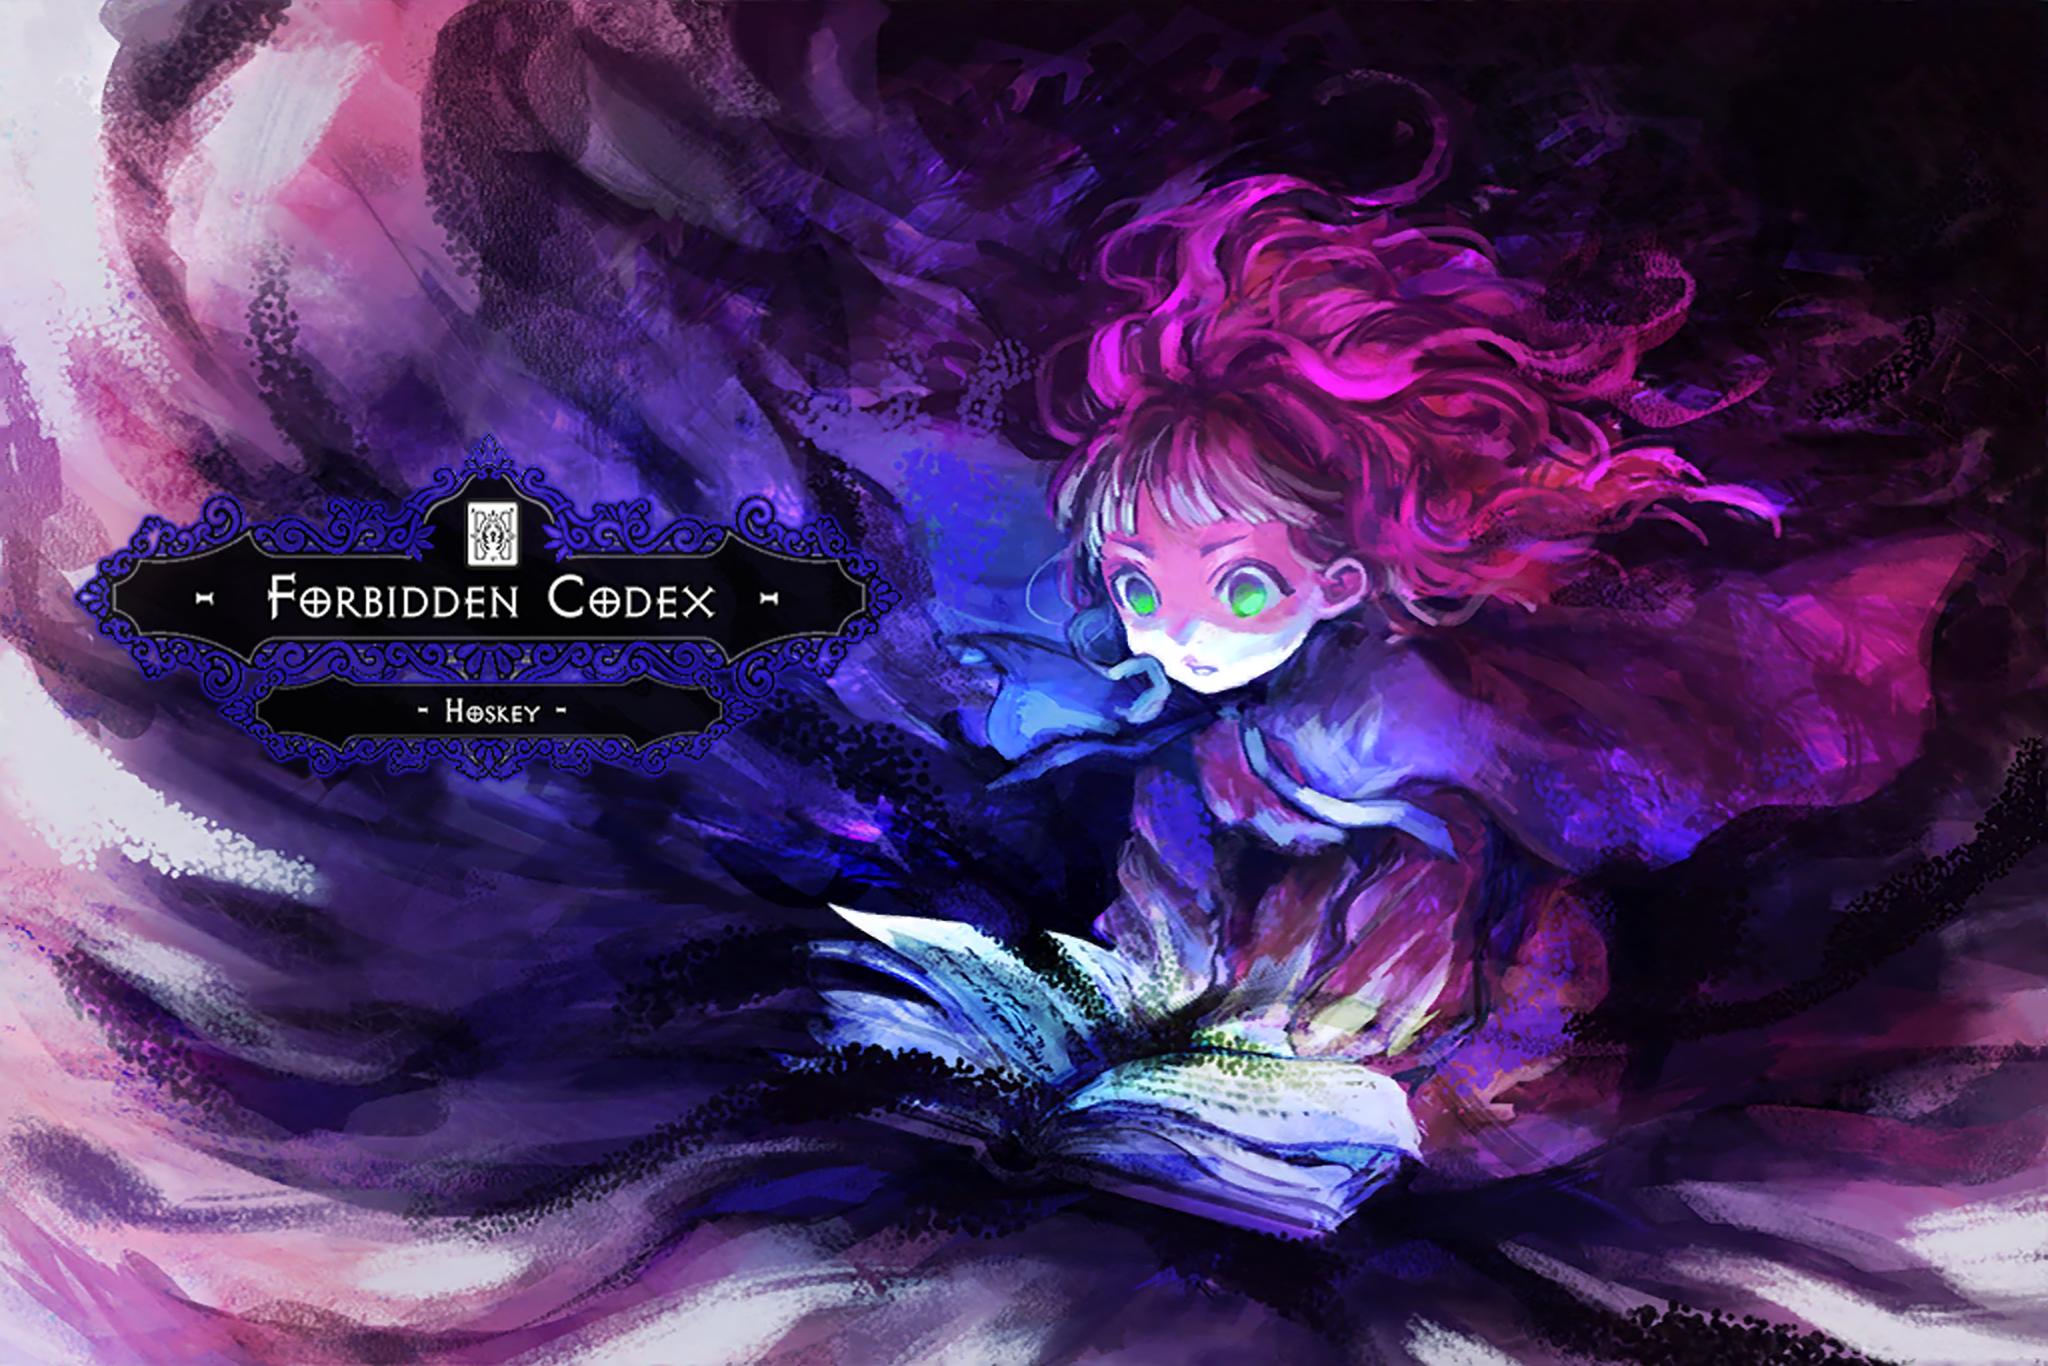 Forbidden Codex